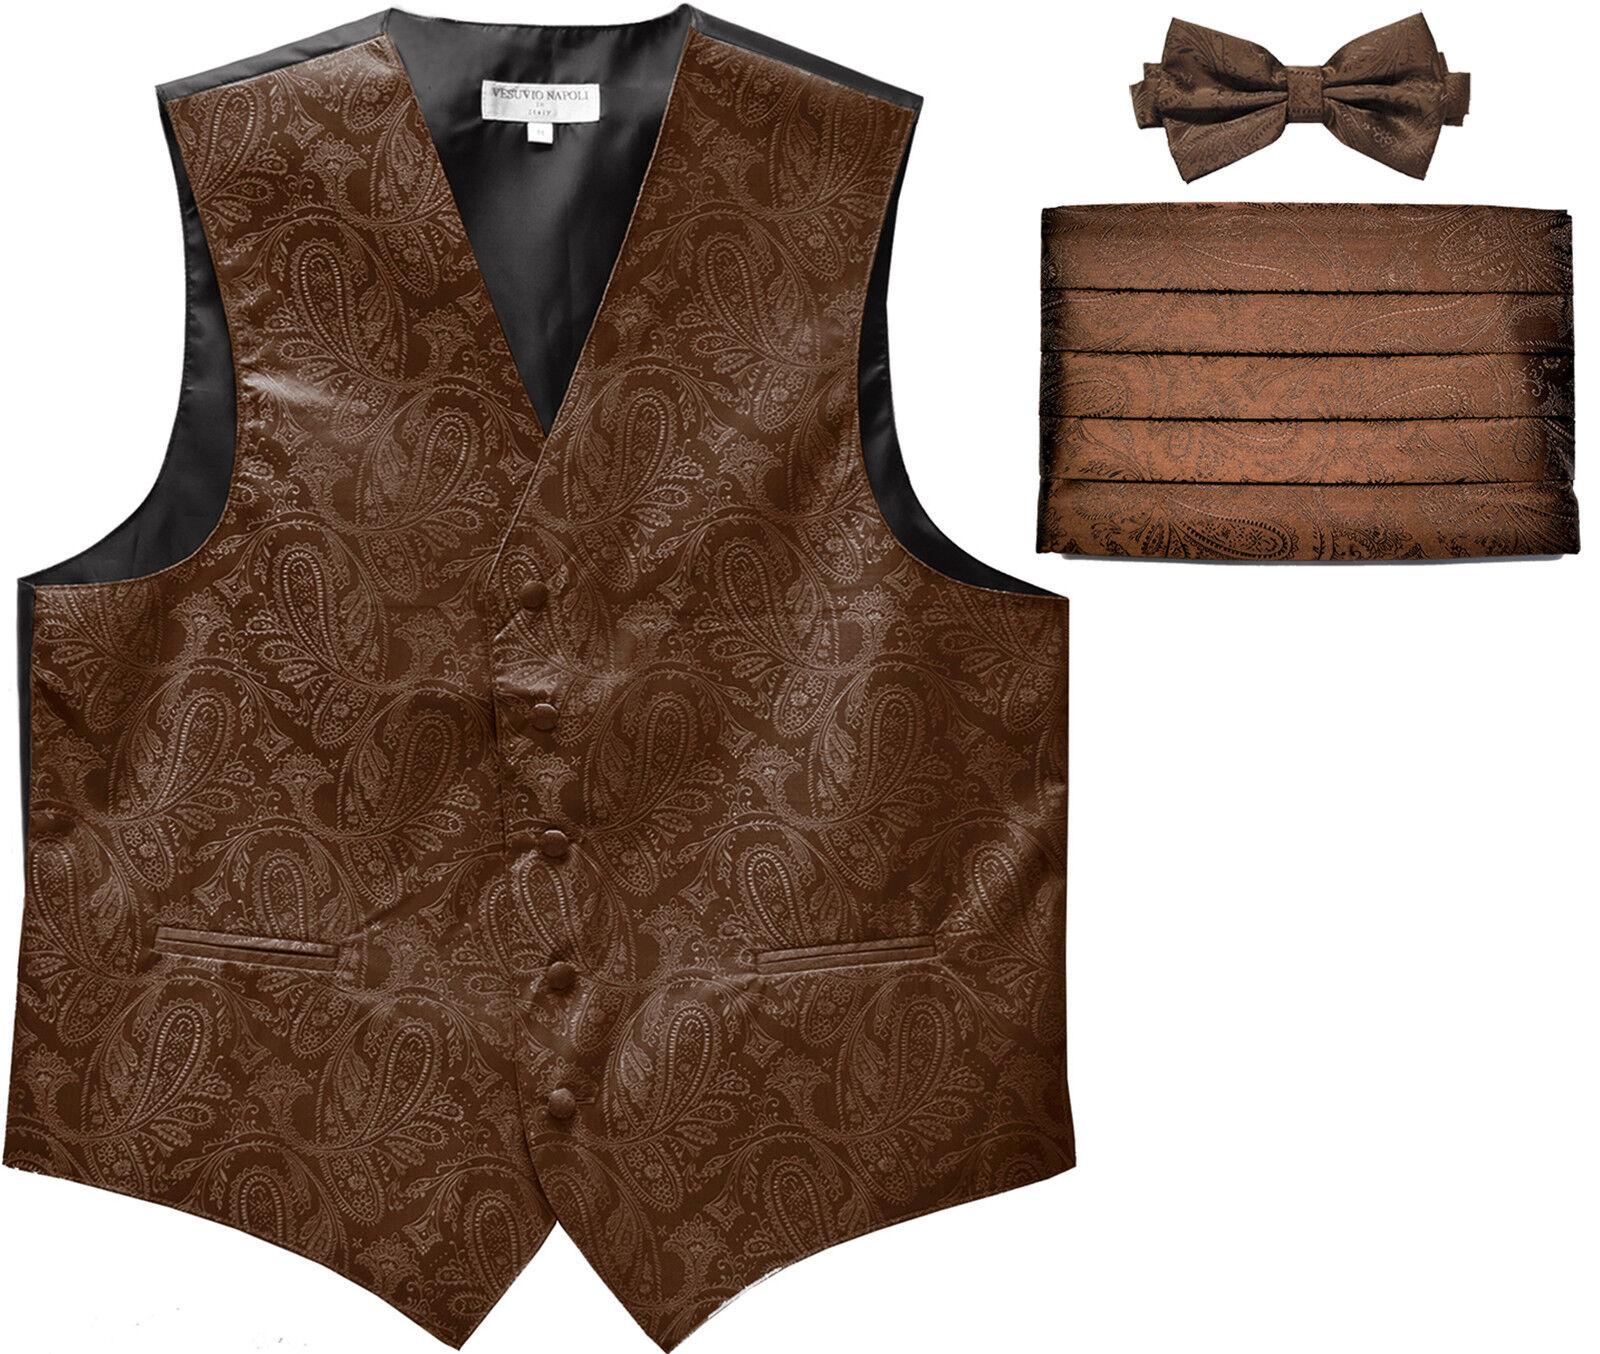 New Men's Paisley Tuxedo Vest Waistcoat & Cummerbund & Bow tie Wedding Brown